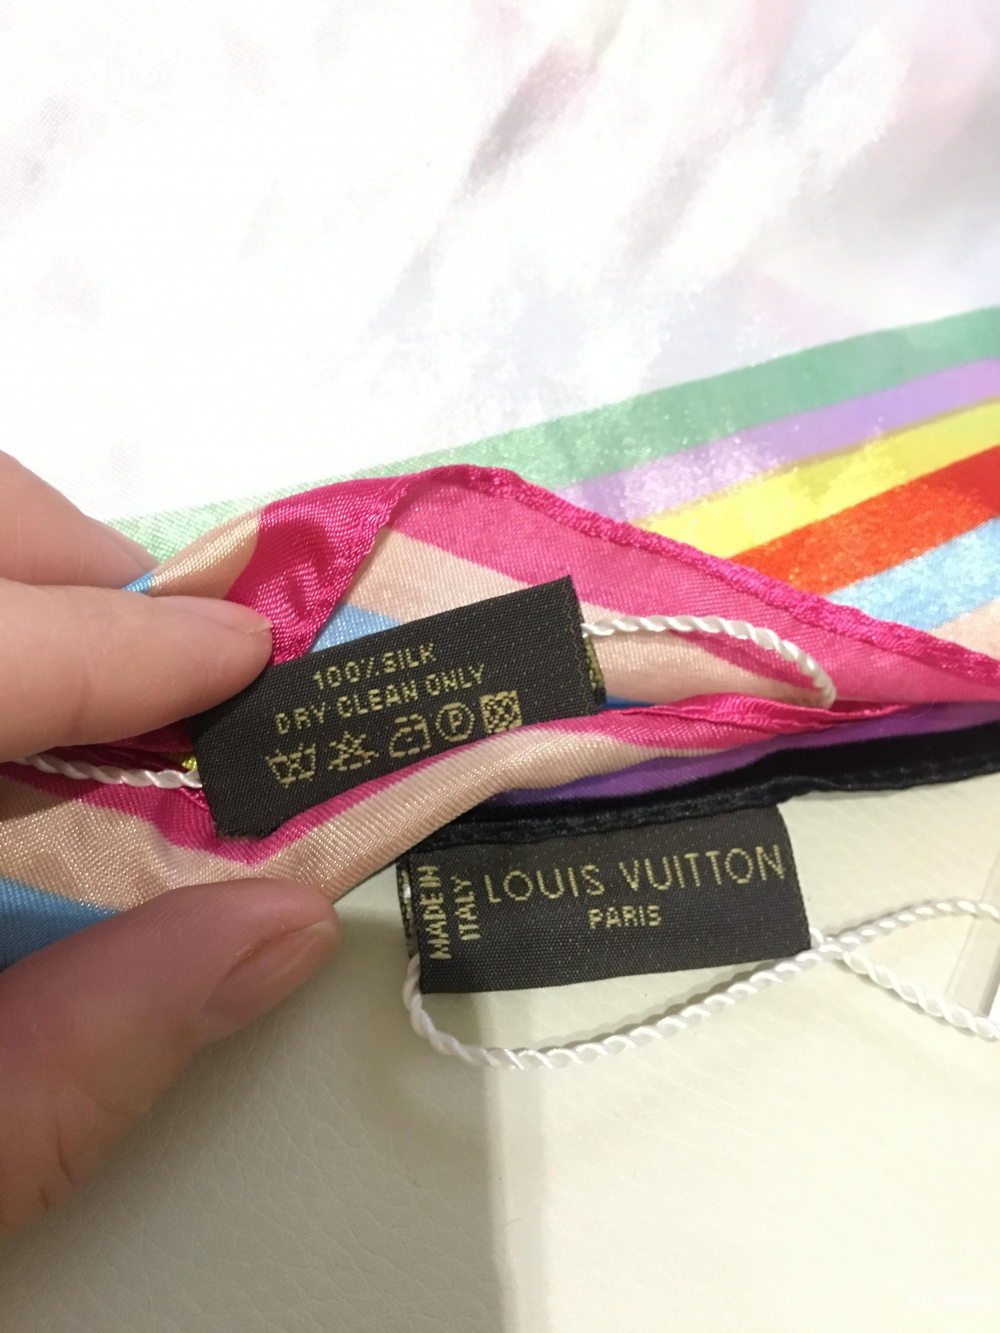 Итальянский платок Louis Vuitton, 70*70, шелк.